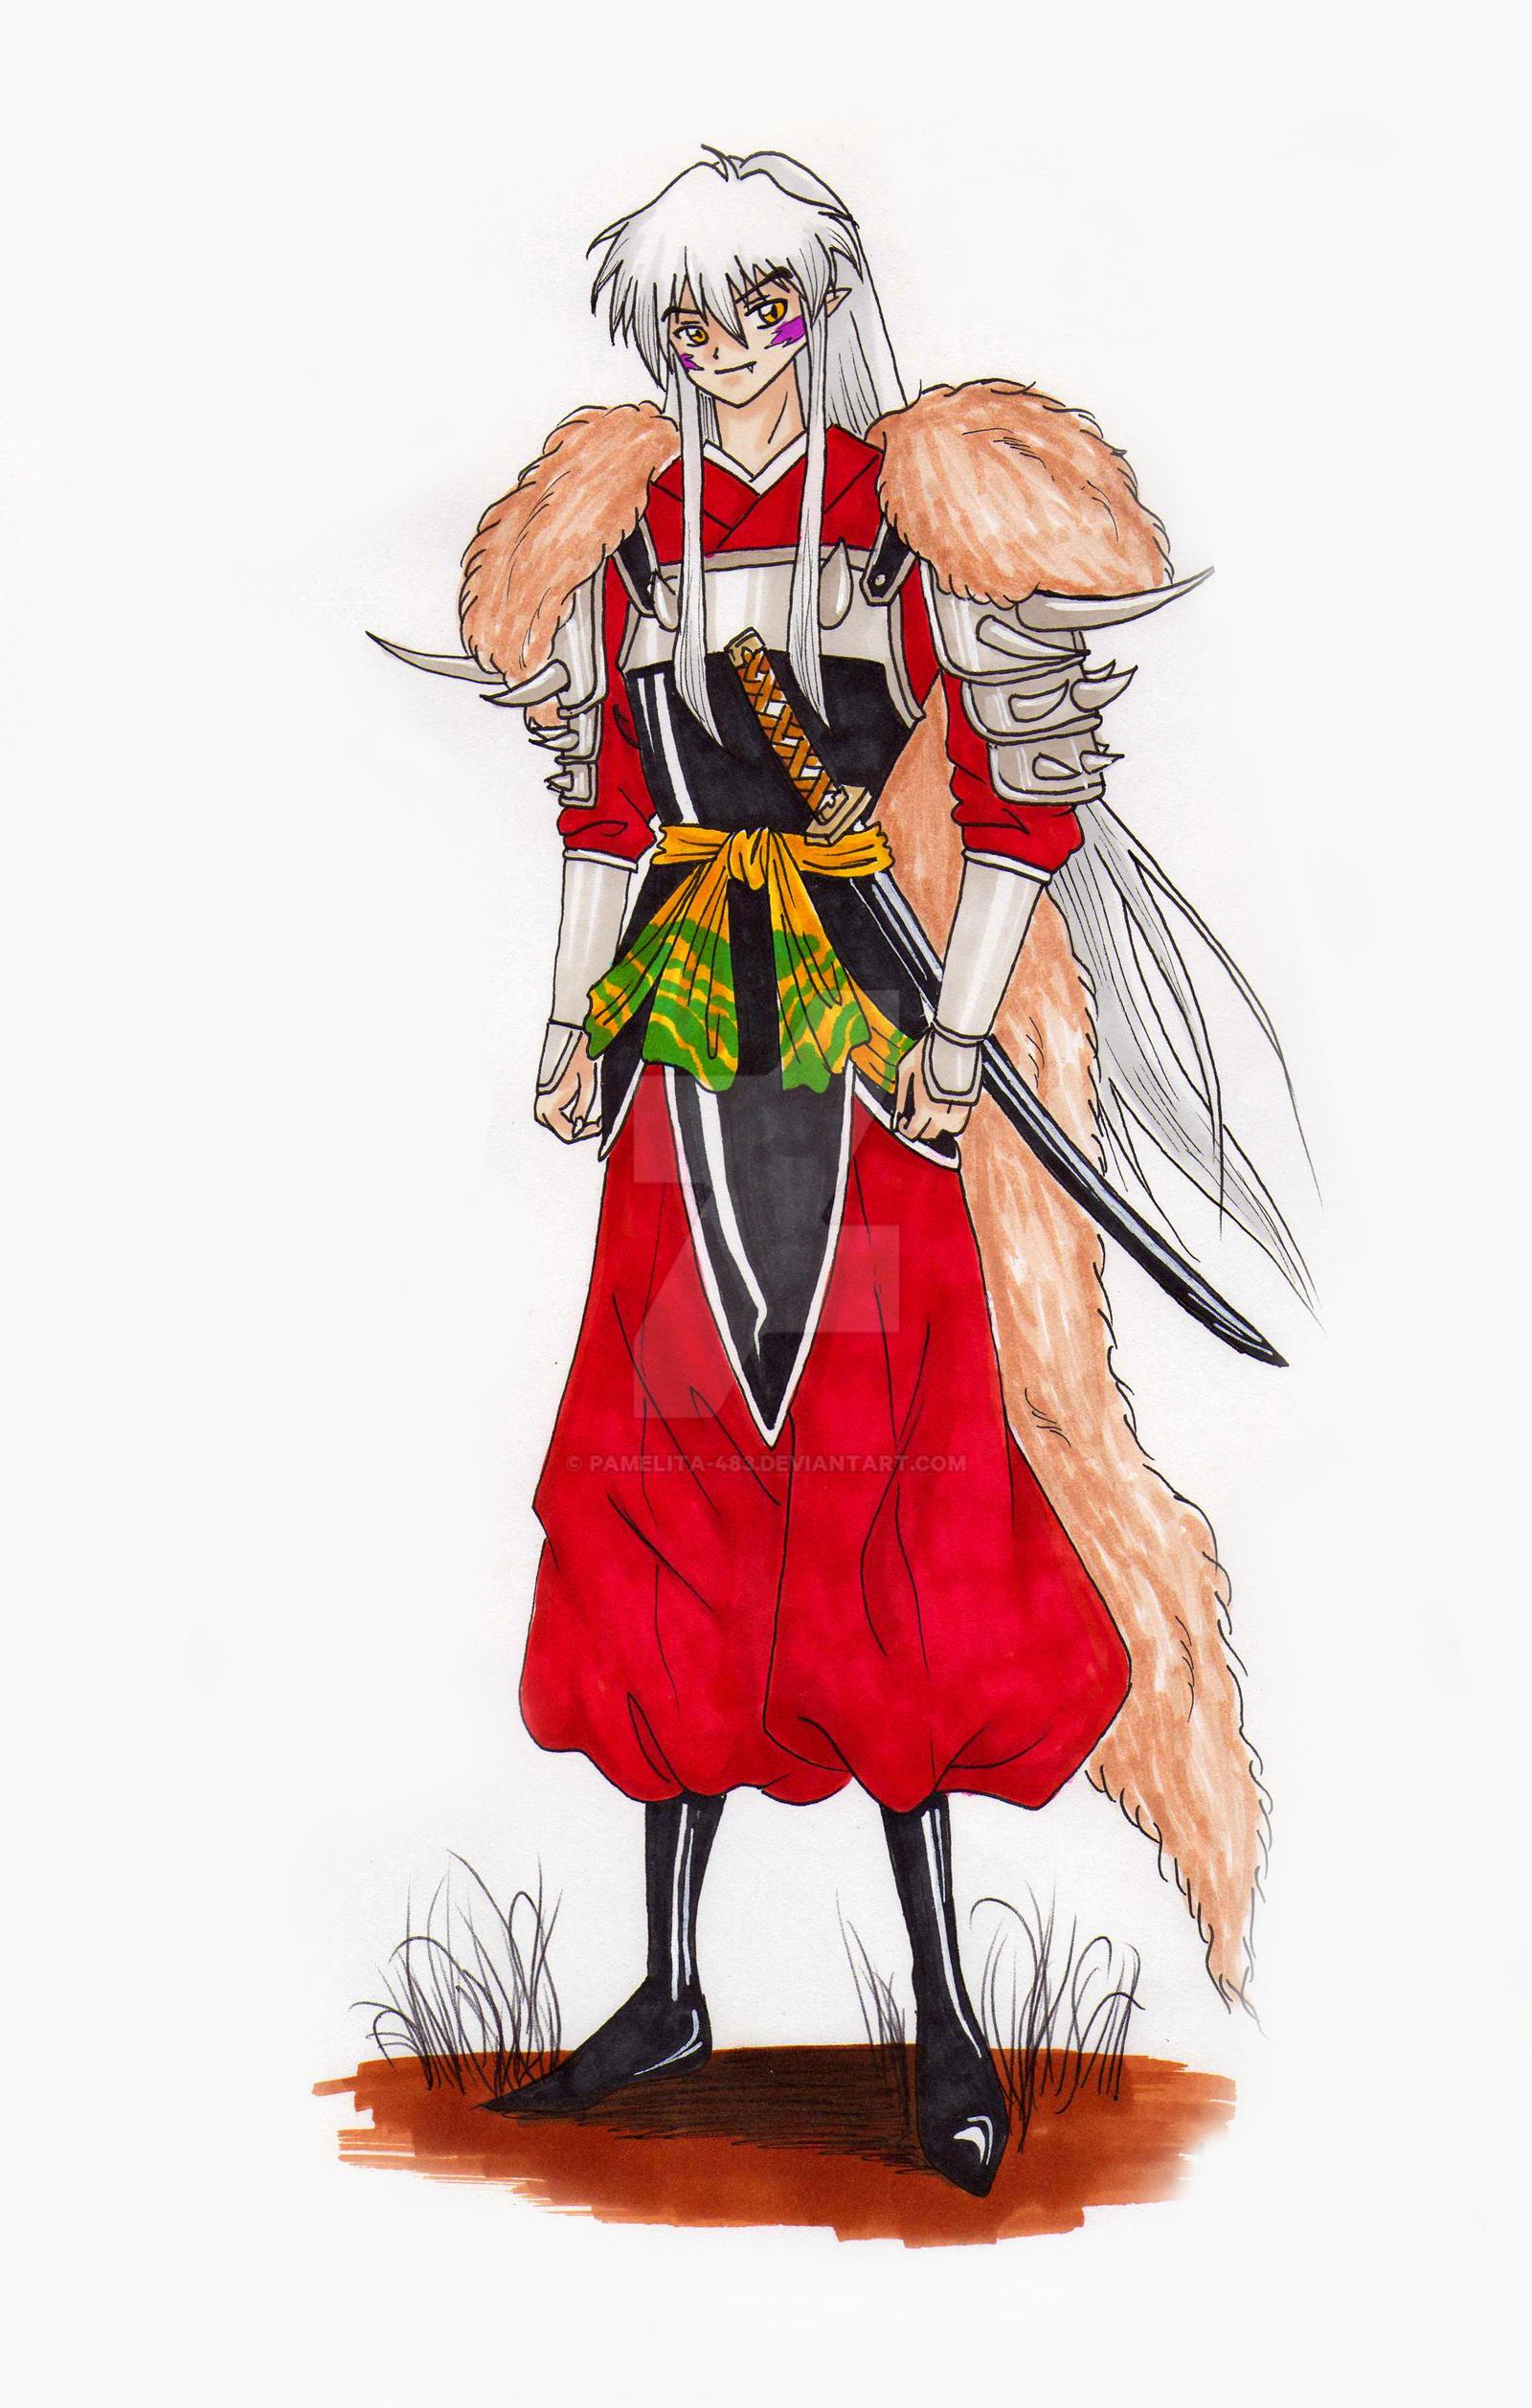 Inuyasha Full Demon Form by Pamelita-483 on DeviantArt